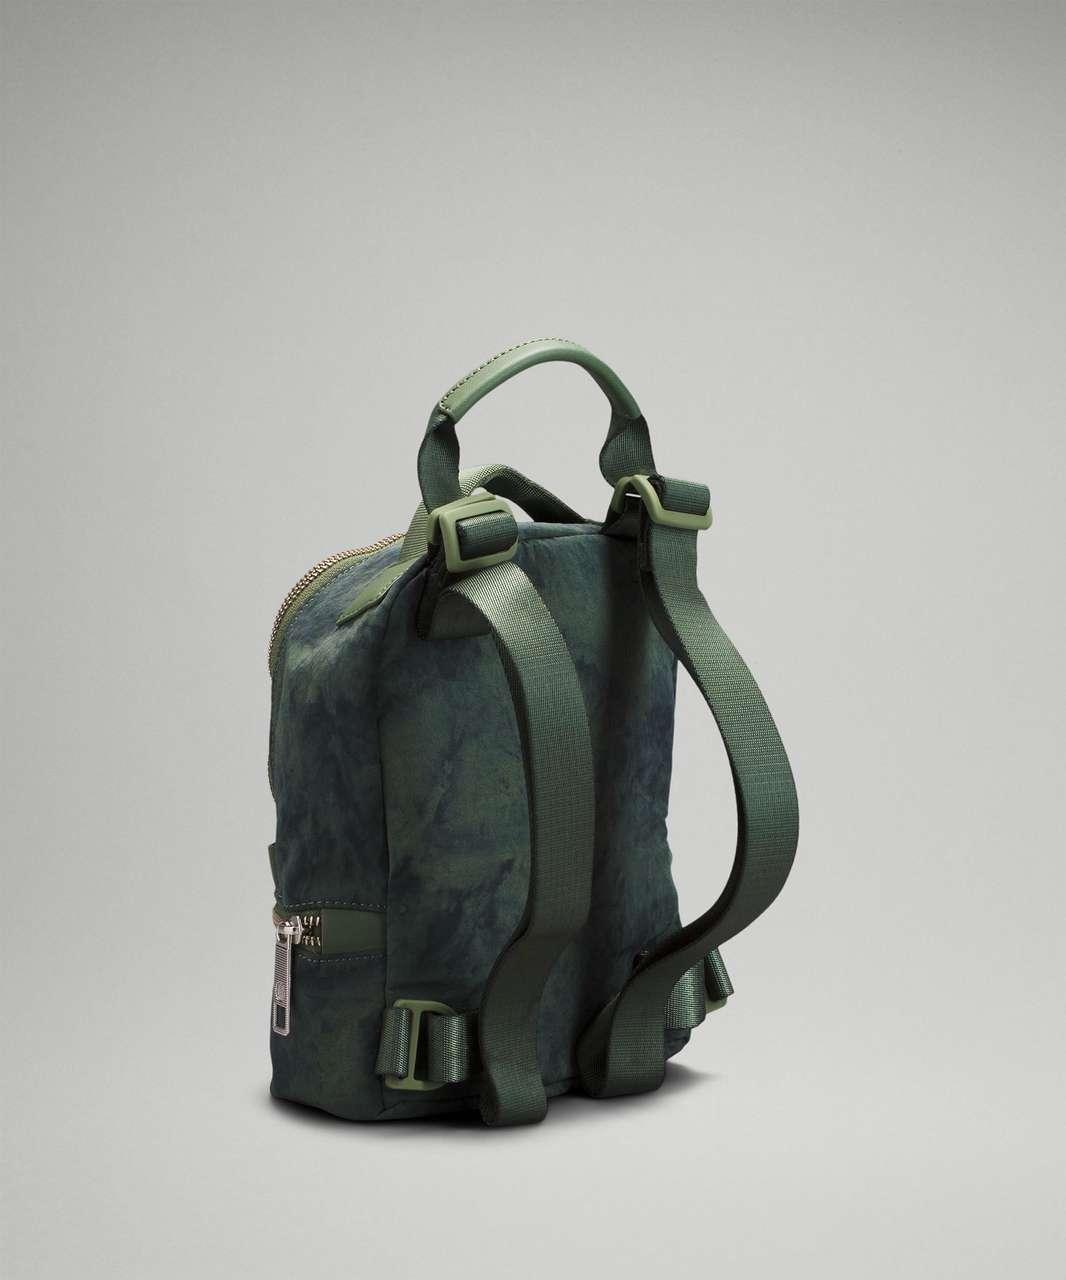 Lululemon City Adventurer Backpack Micro 3L - Aquila Green Twill Multi